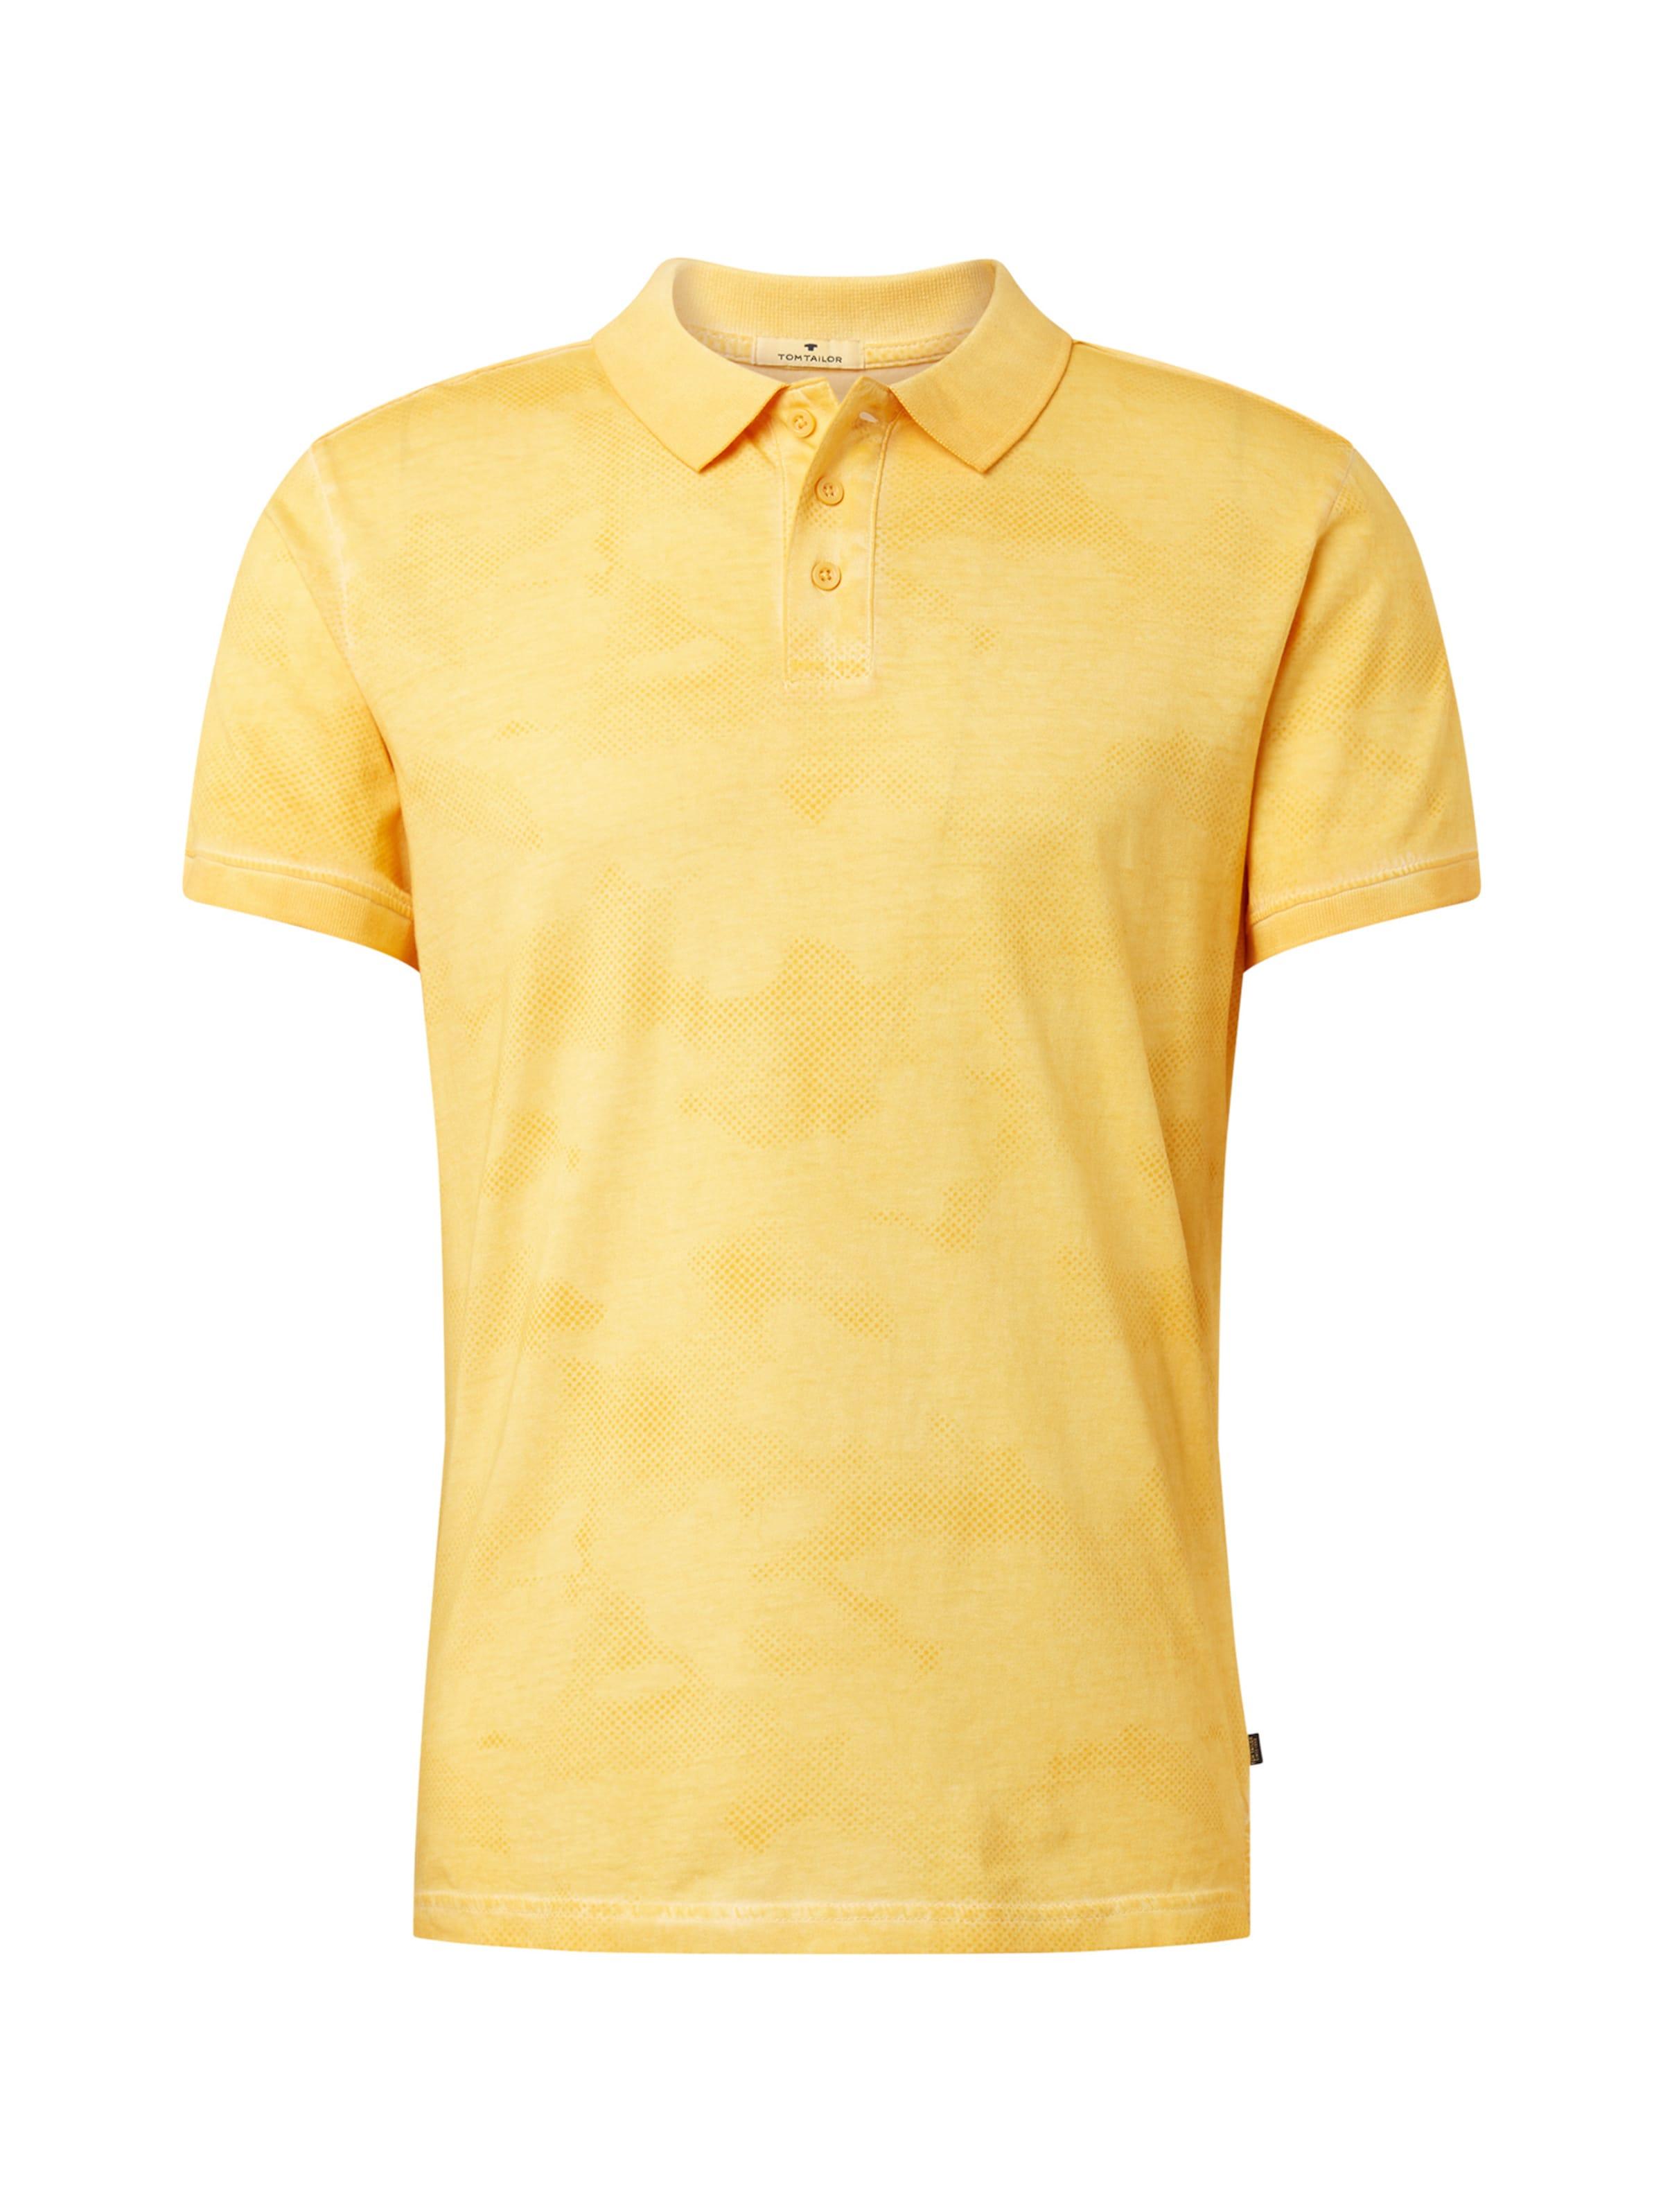 Gelb Tailor Gelb Tailor Tom Tom Tom In In Poloshirts Poloshirts SUMpGqjLVz